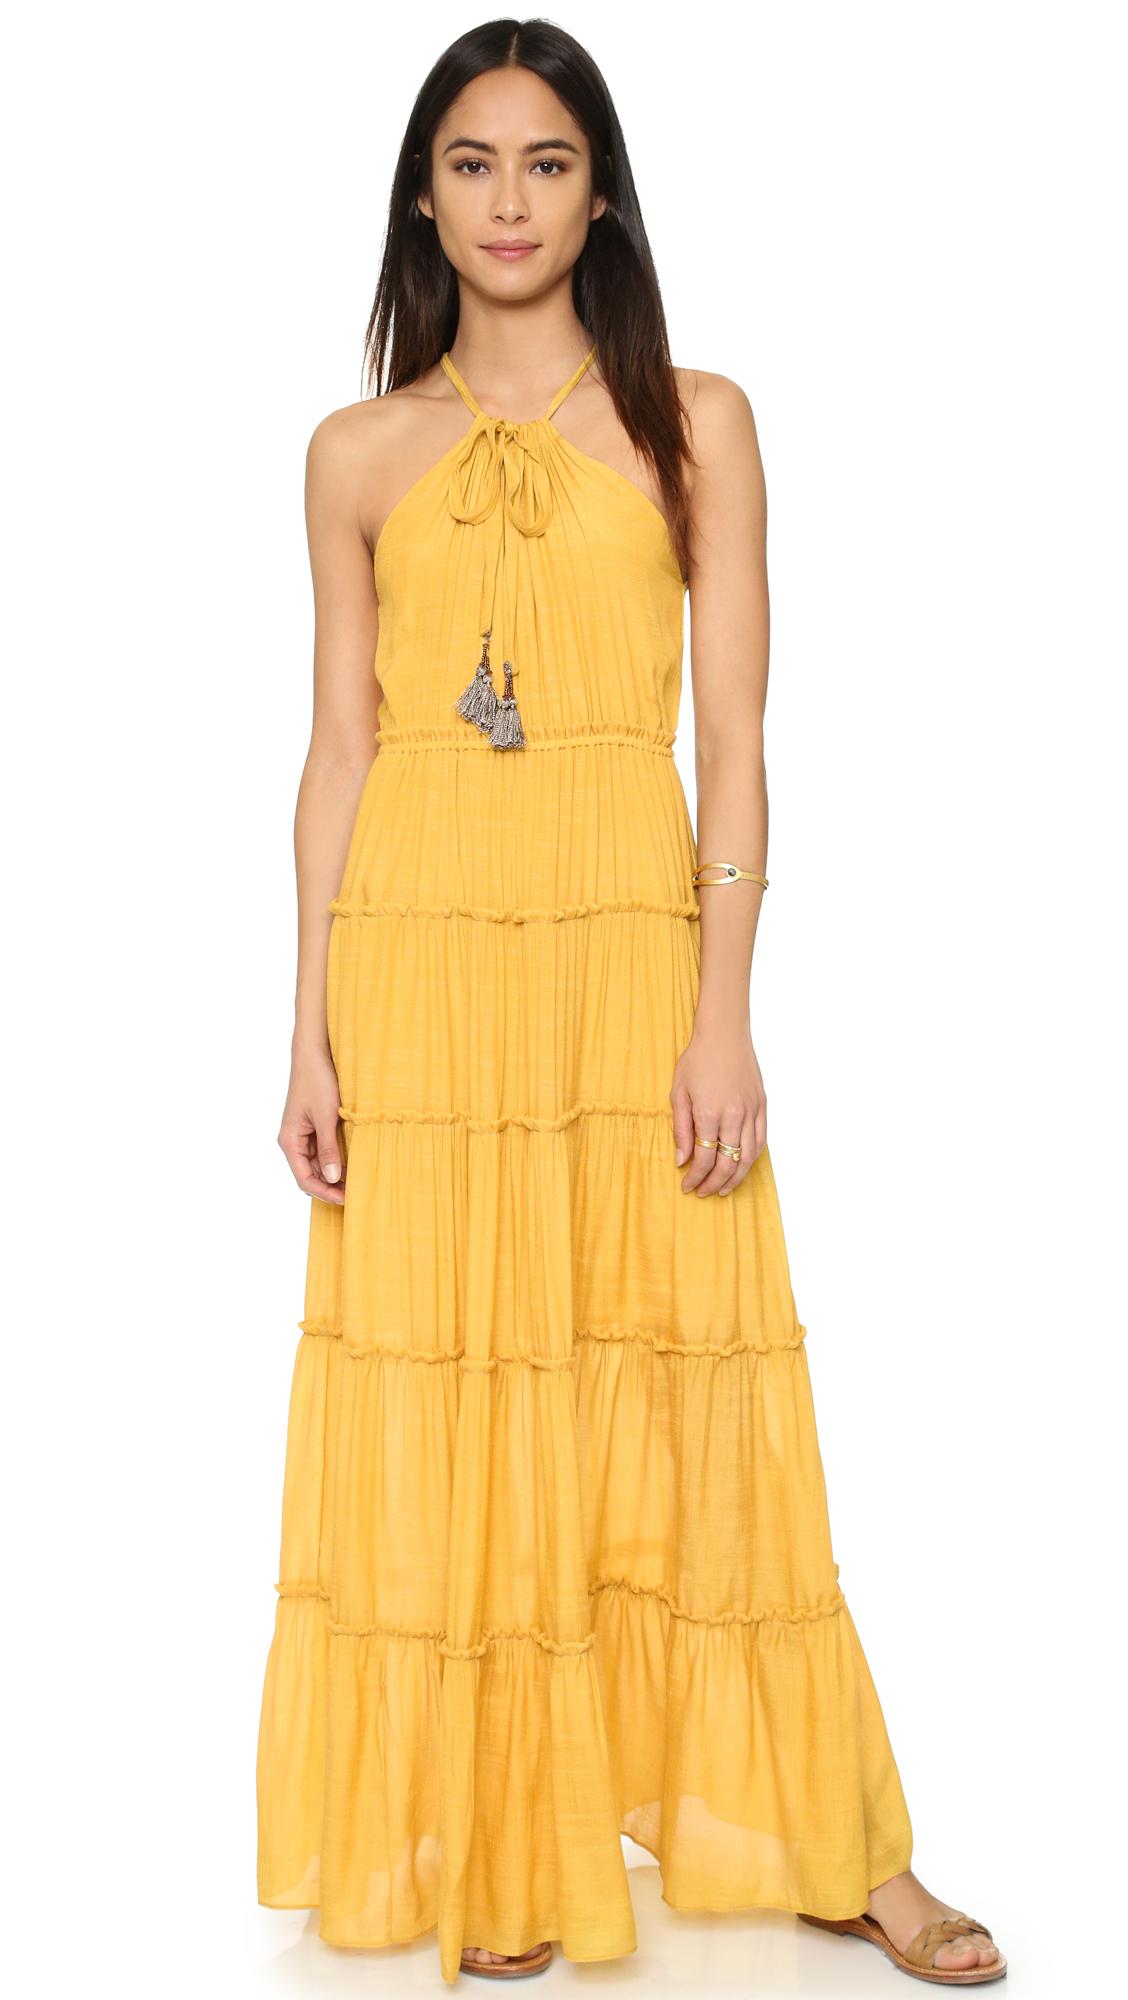 Lyst T Bags Ruffle Maxi Dress Mustard In Yellow